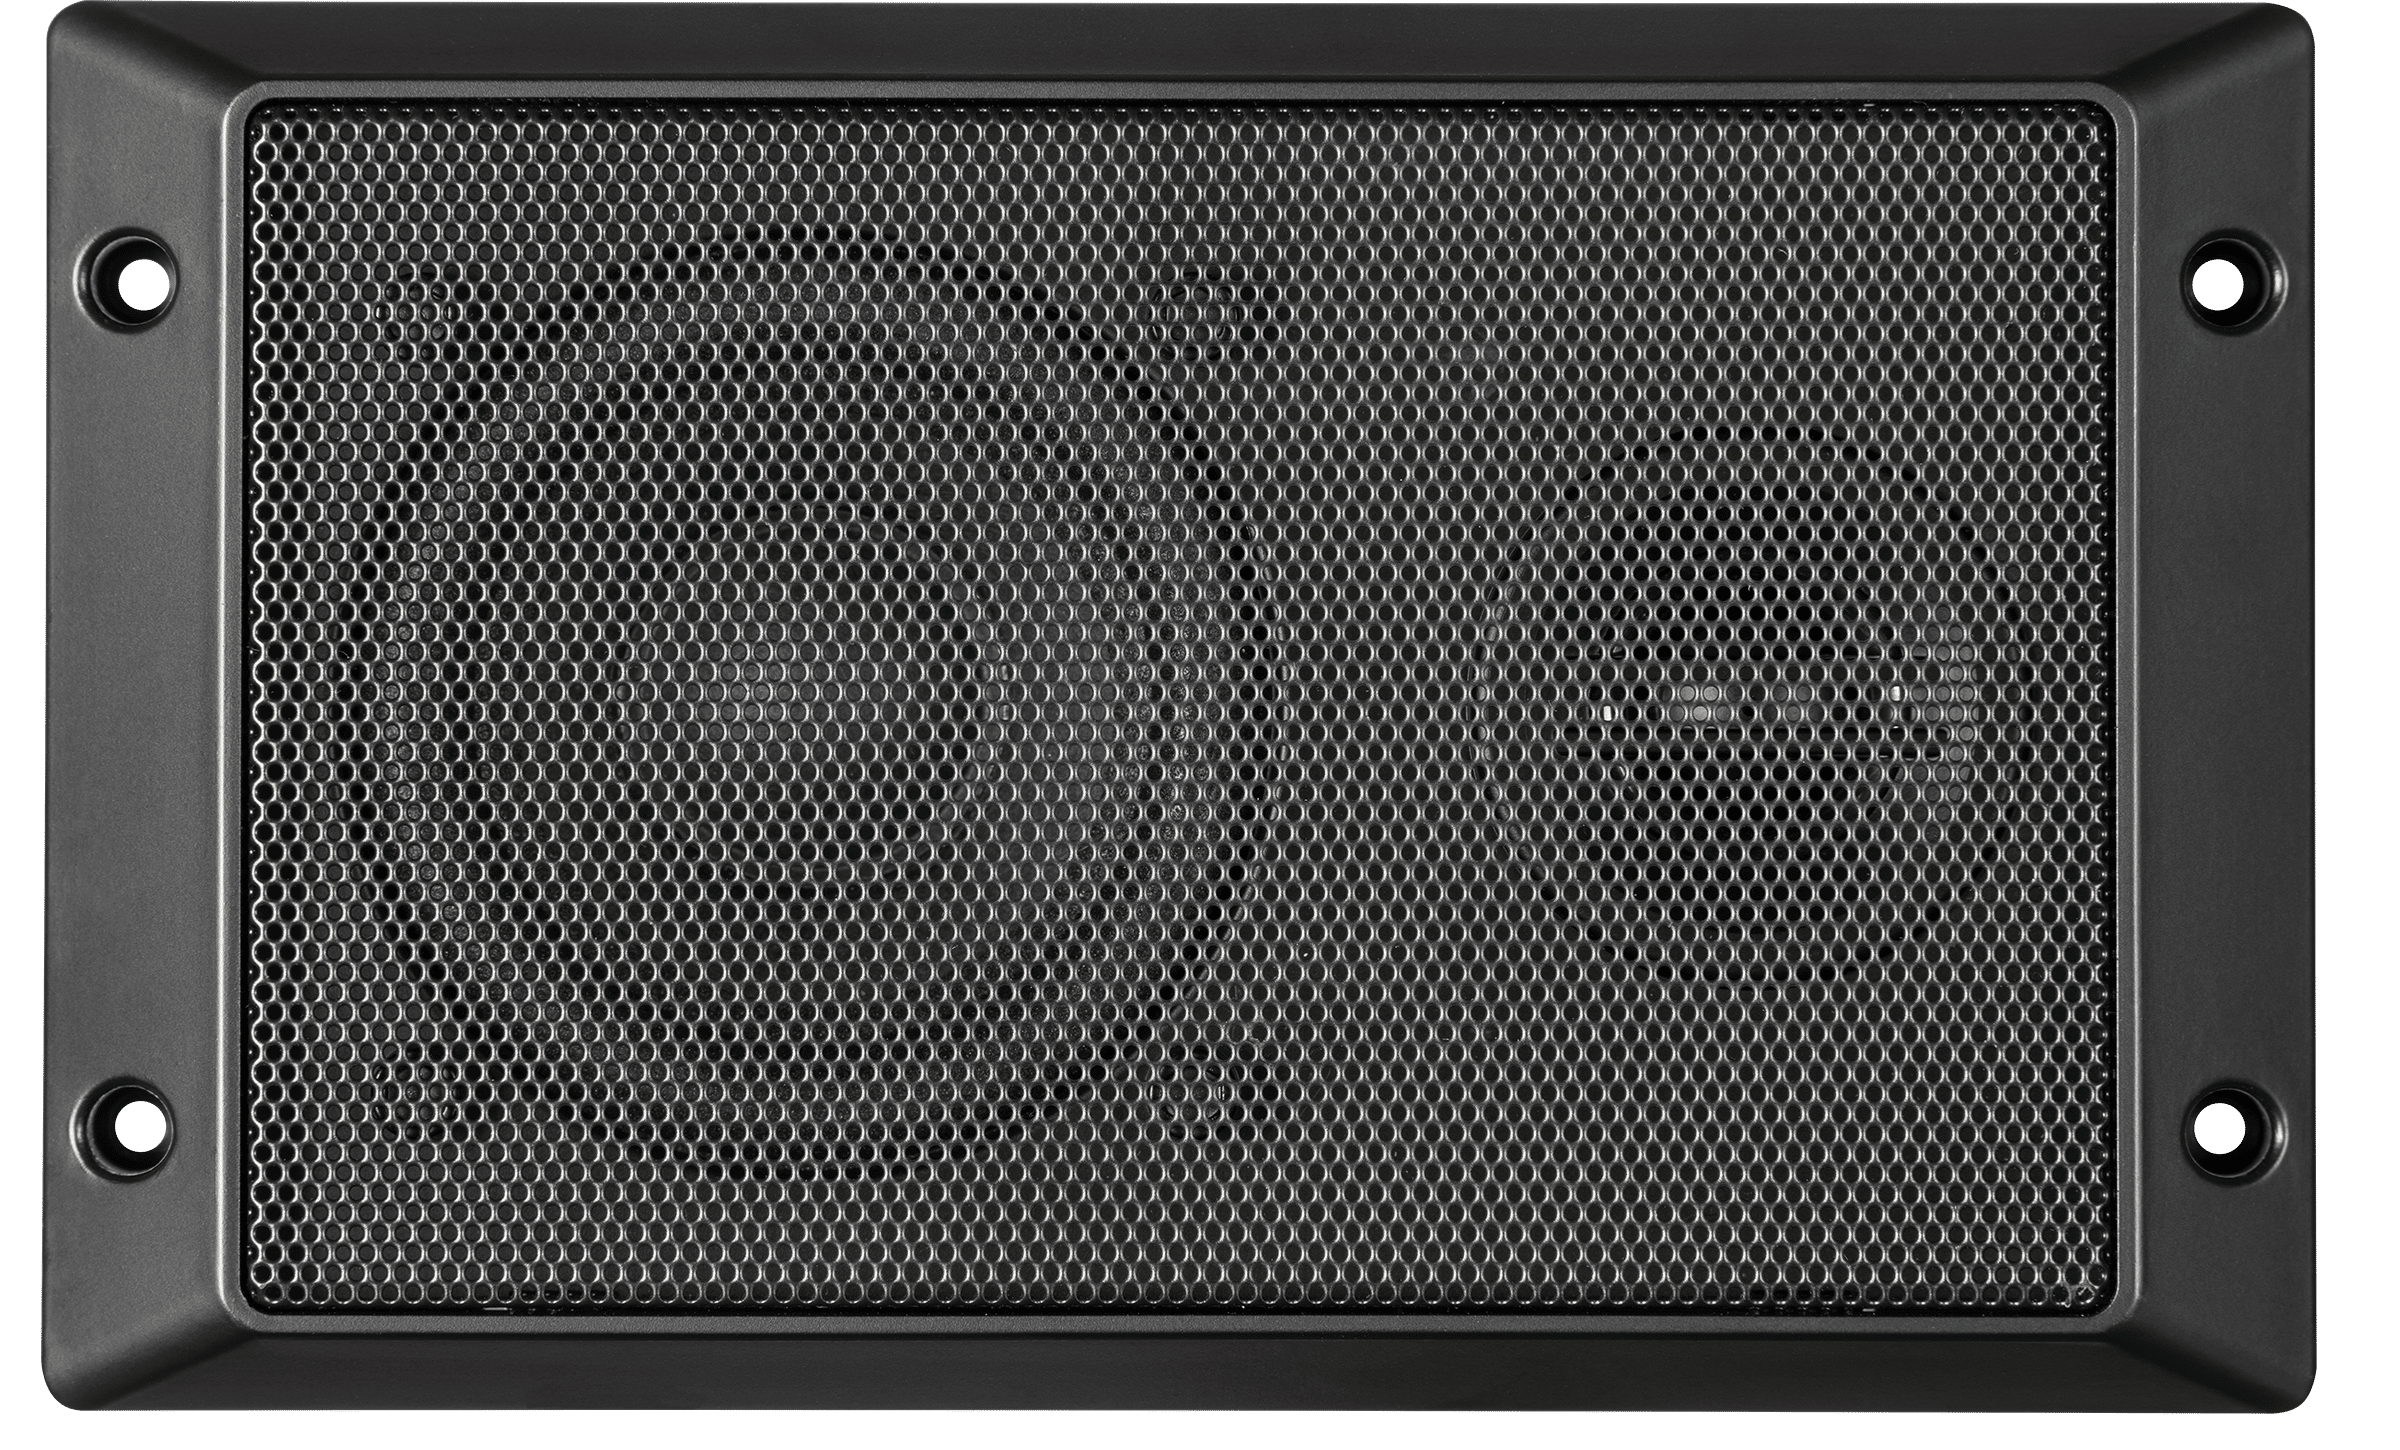 ASA Electronics® Debuts New RV Speaker